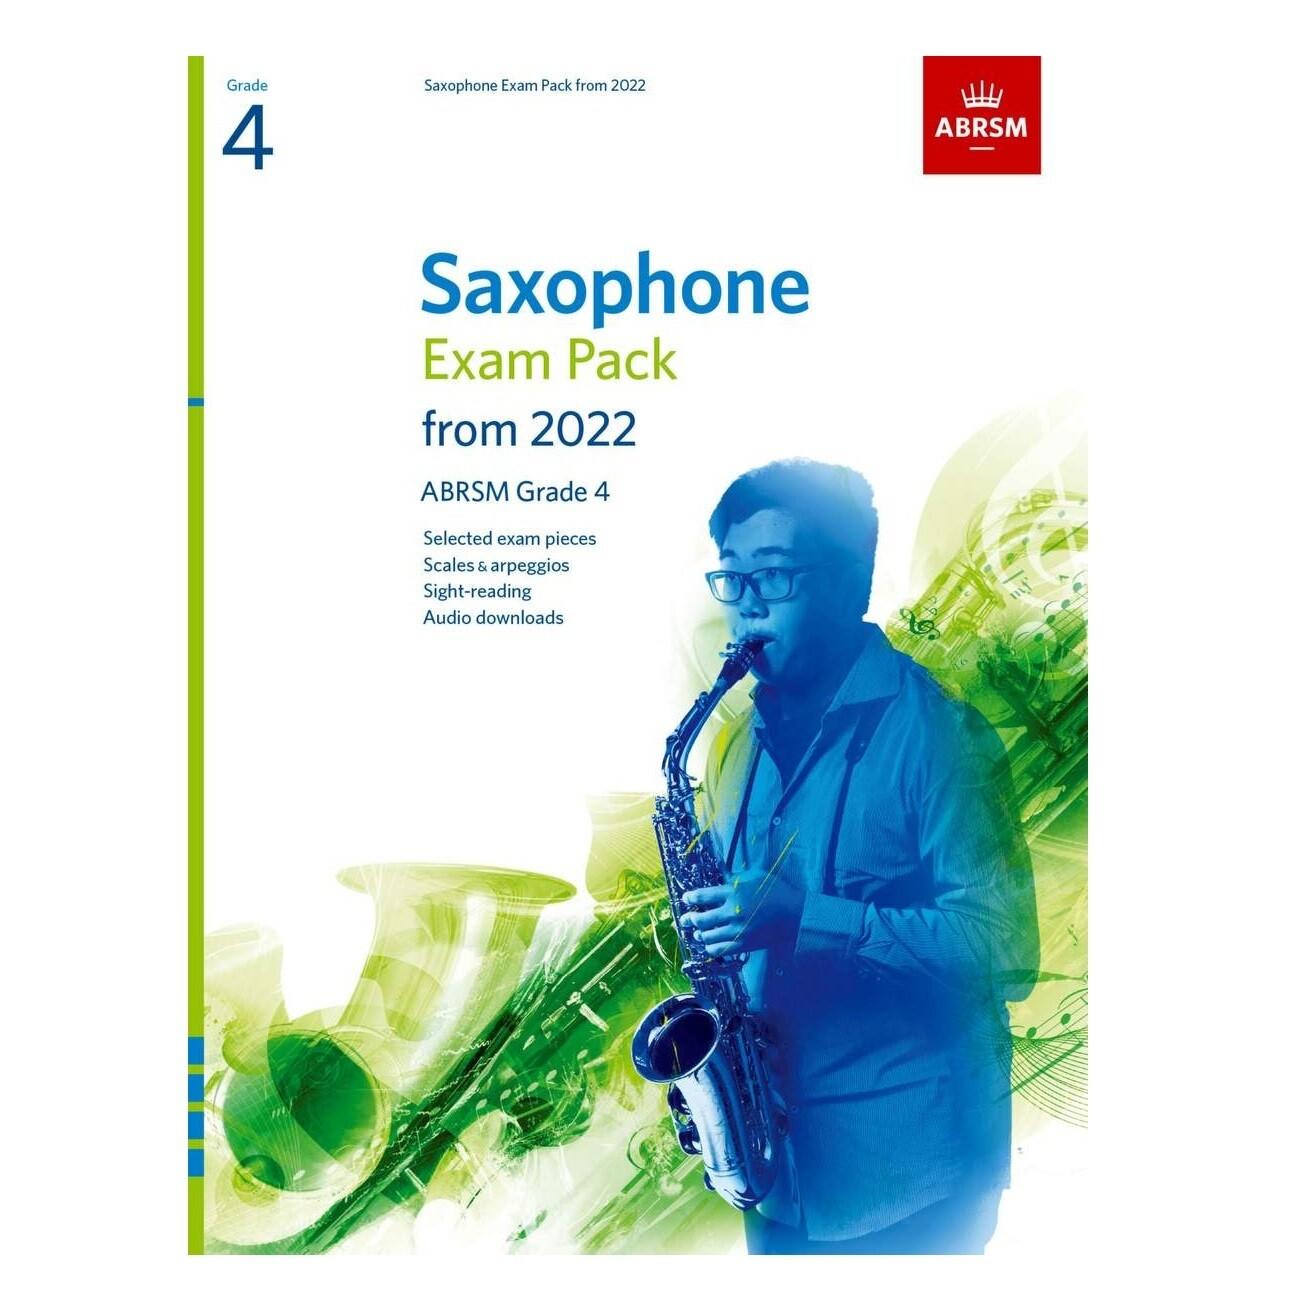 ABRSM Saxophone Exam Pack Grade 4 2022-2025